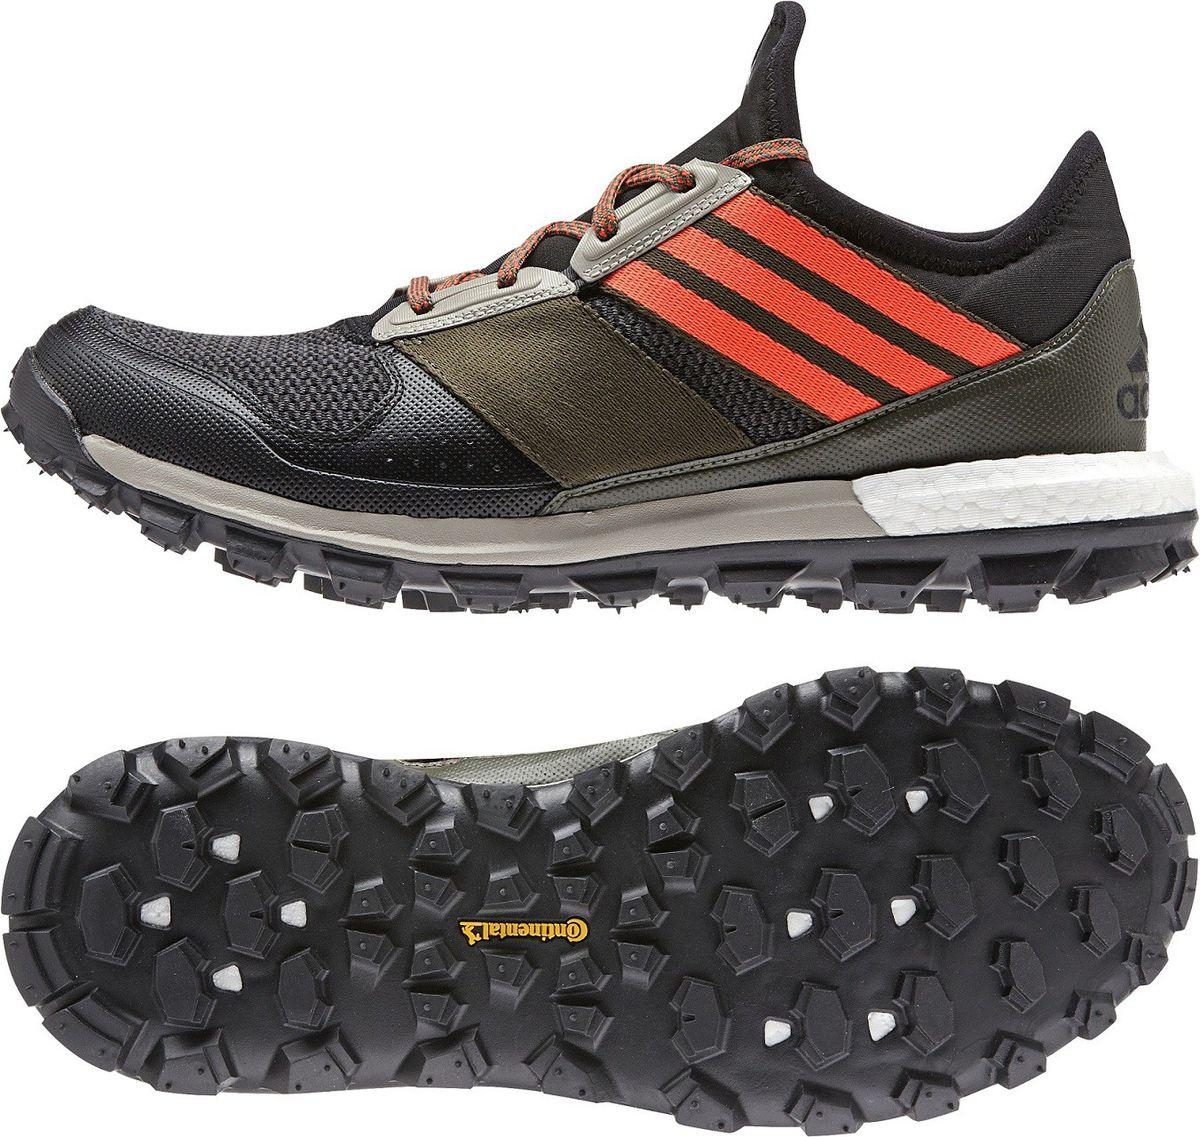 Picking A Trail Running Shoe